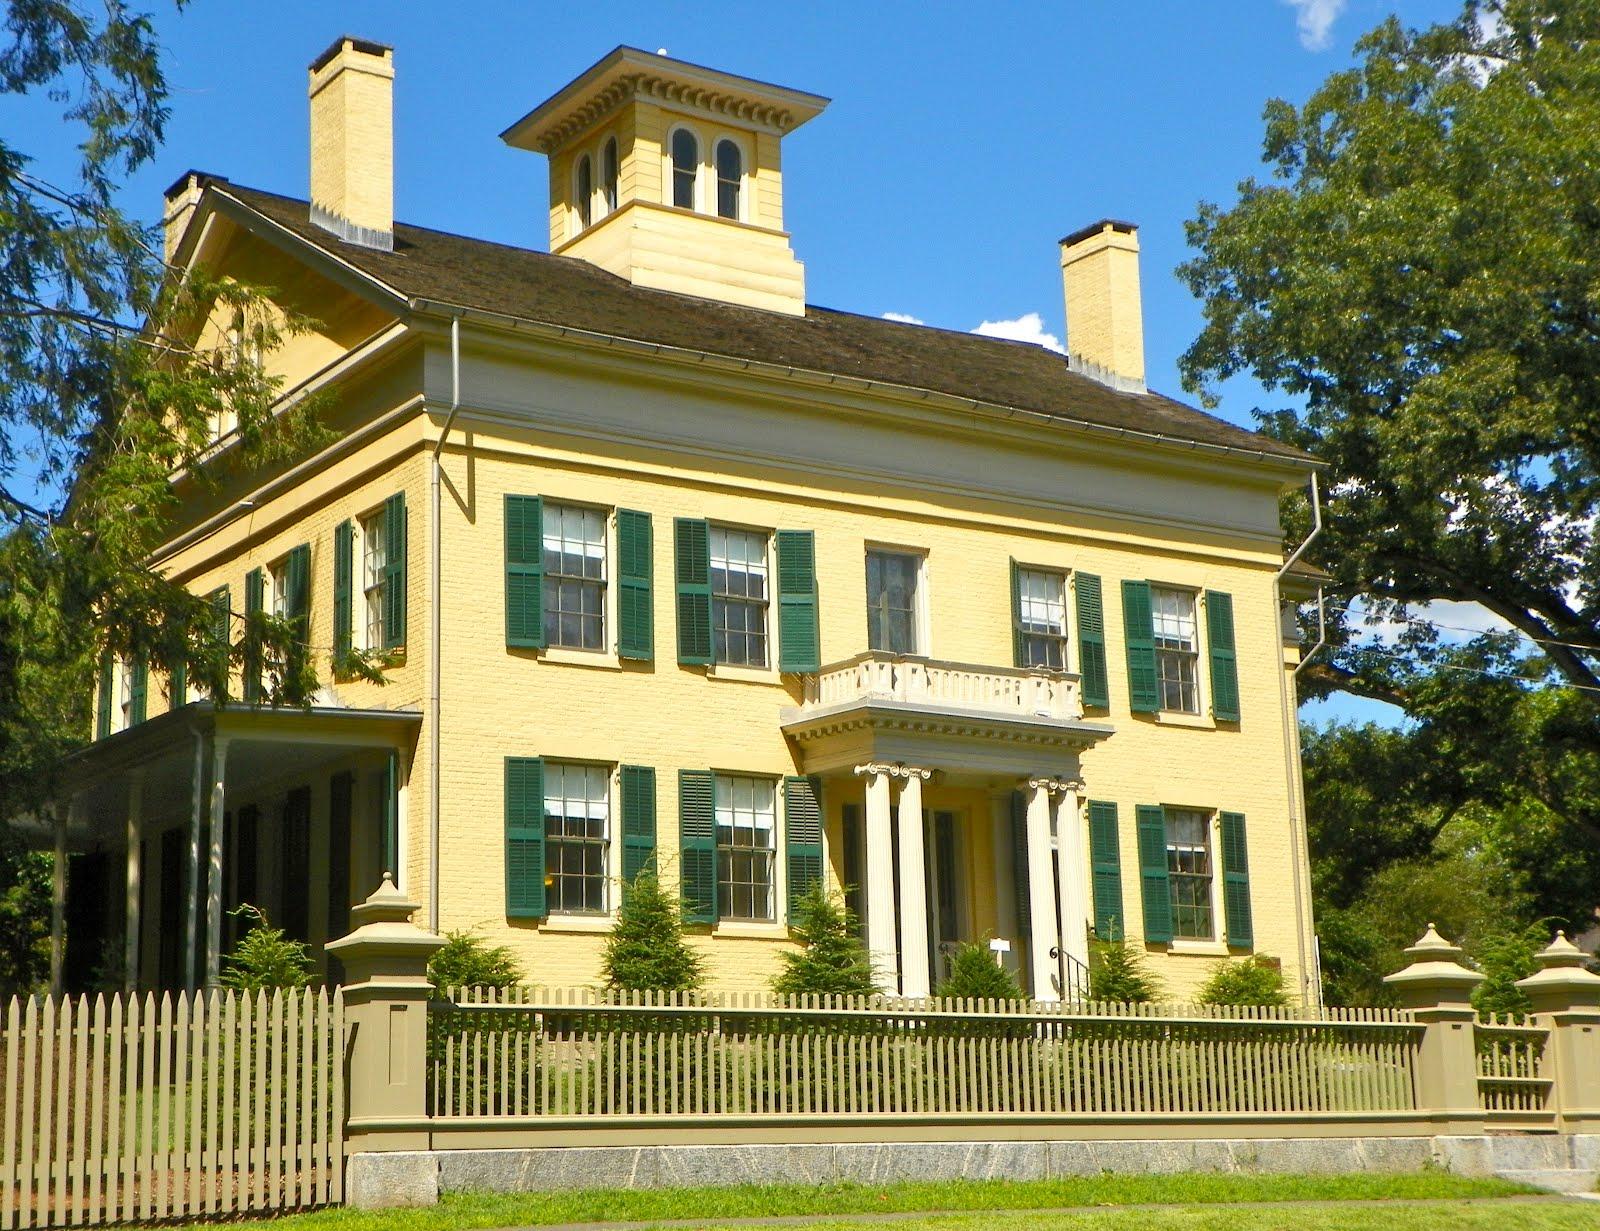 Emily Dickinson's Homestead in Amhearst, MA